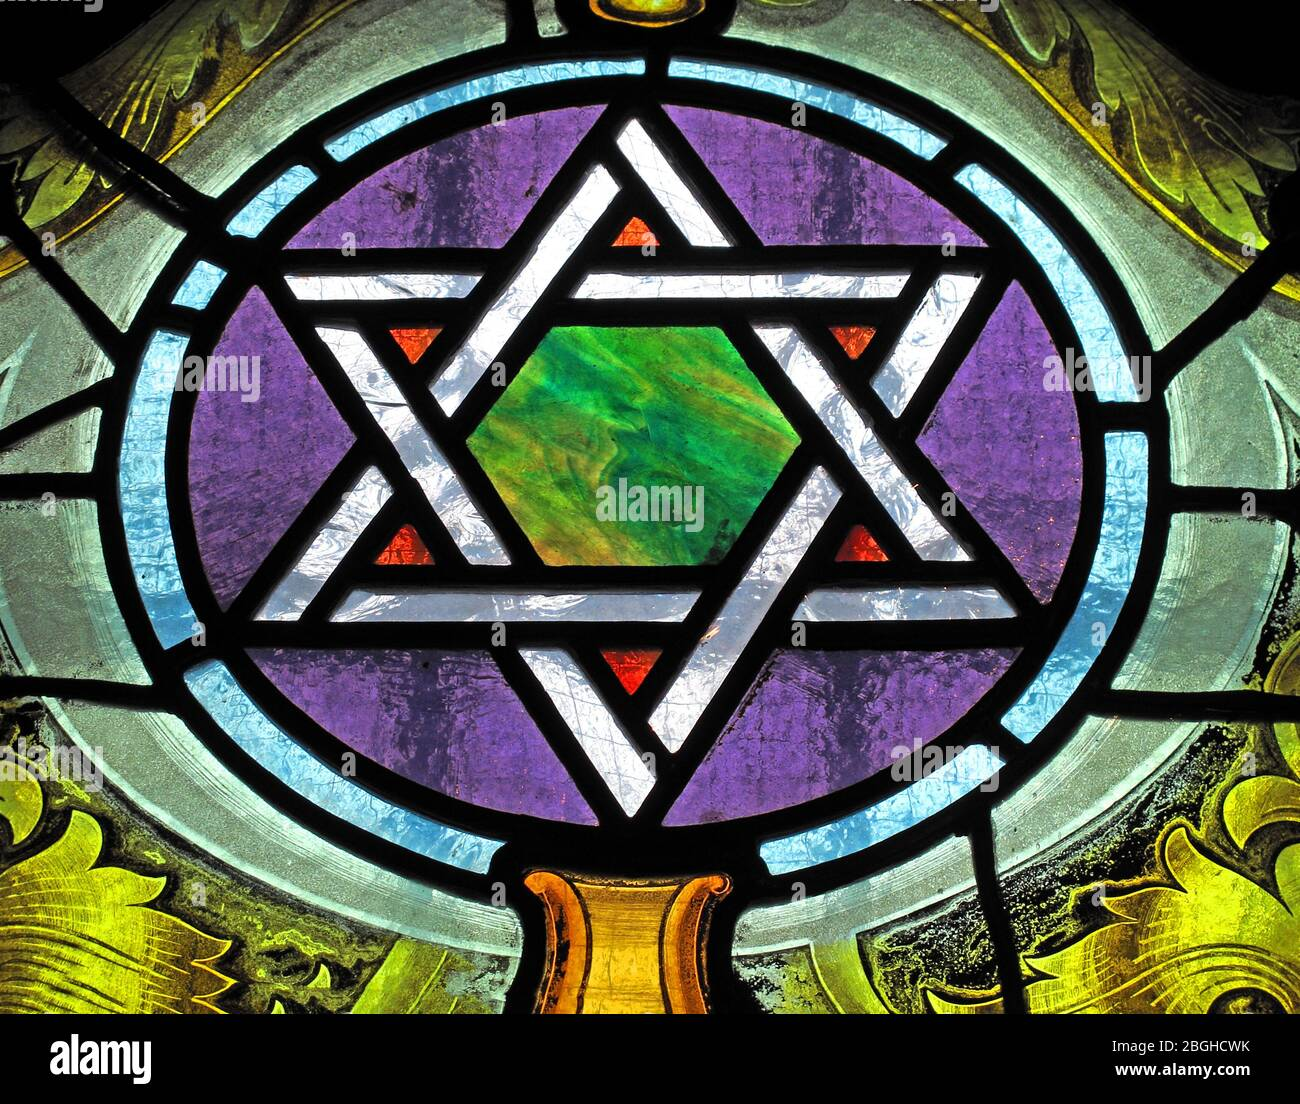 @hotpixuk,Hotpixuk,GoTonySmith,Magen David,jew,Jewish,Abrahamic religions,Abrahamic,religion,faith,Jewish faith,Jew,identity,Judaism,symbol,Shield of David,hexagram shape,hexagram,shape,synagogue,Jewish communities